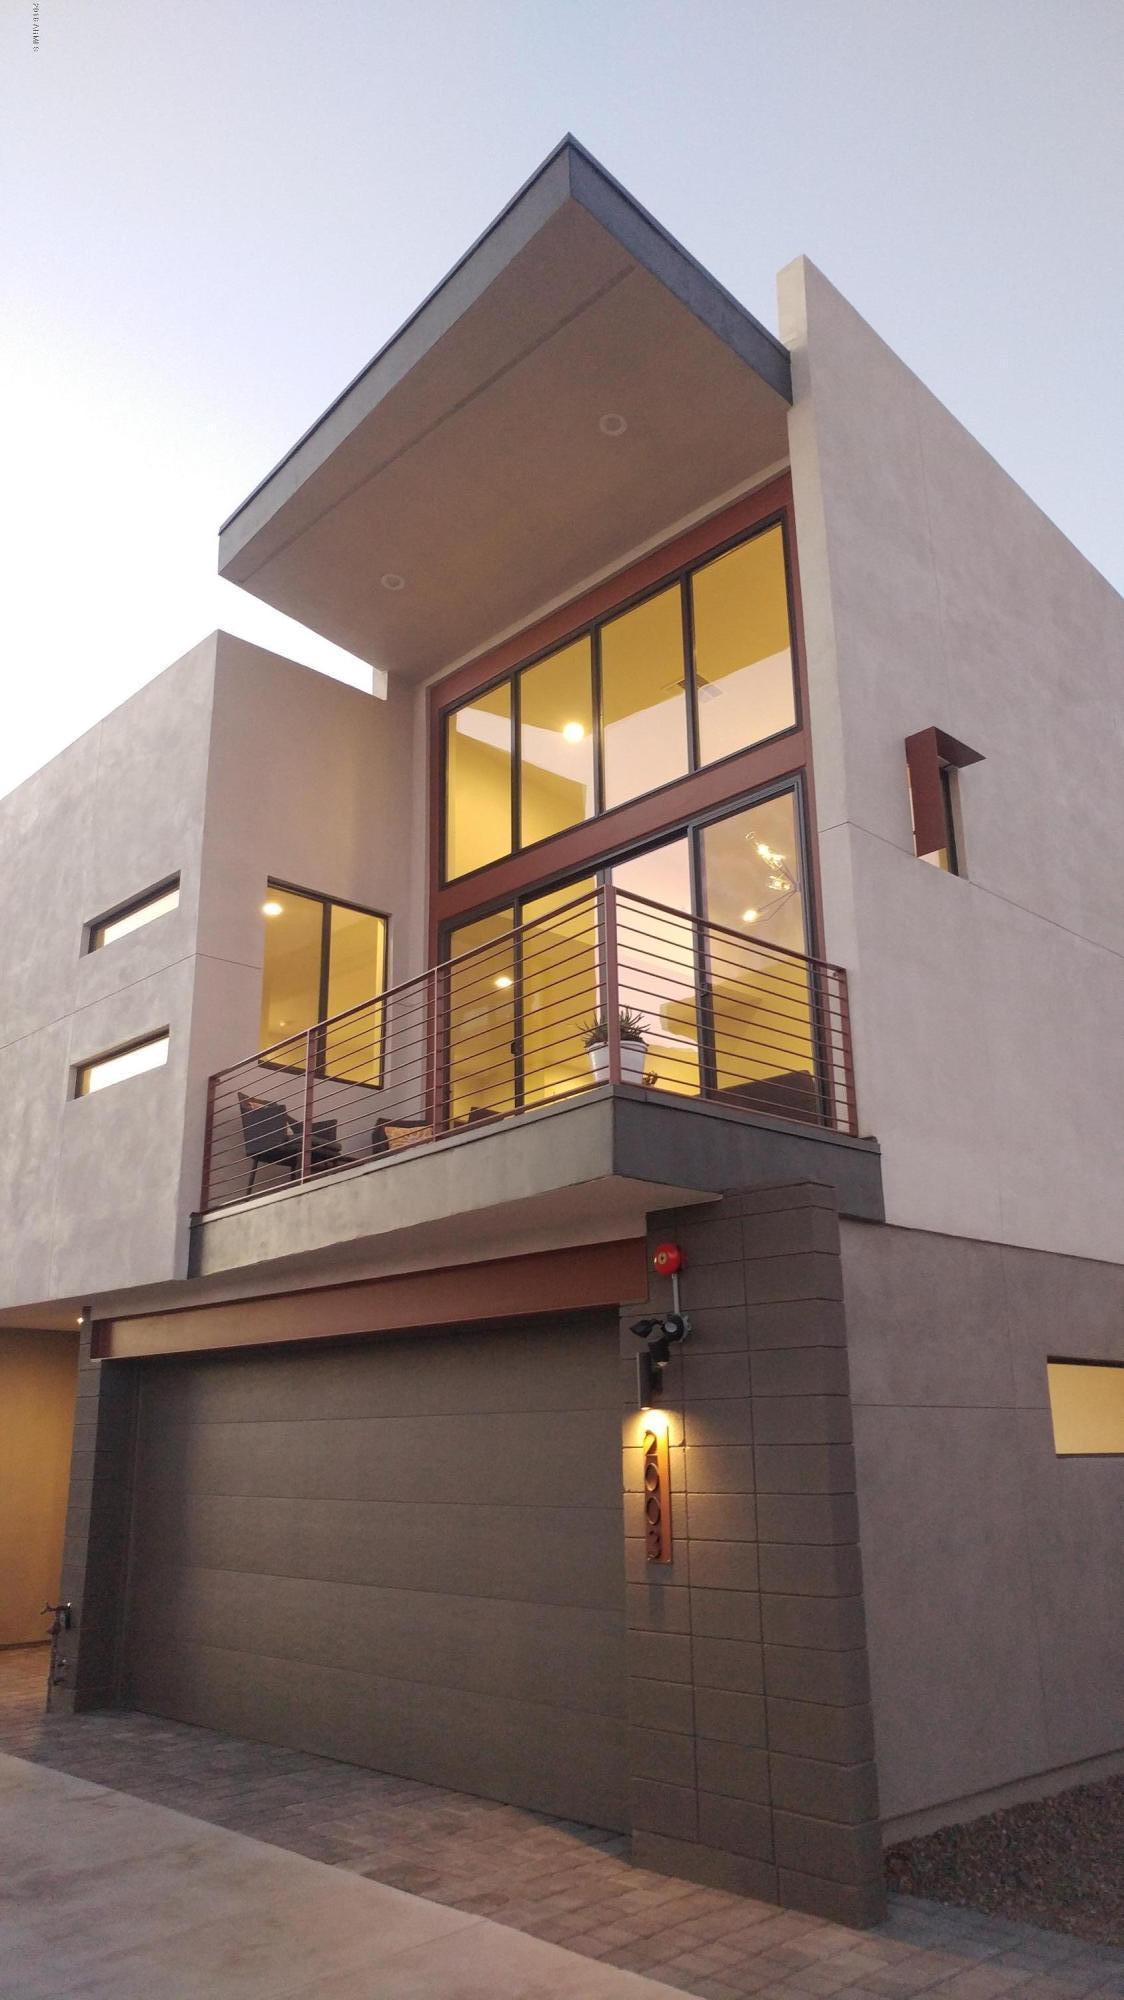 Photo of 3106 N 70TH ST Street #2003, Scottsdale, AZ 85251